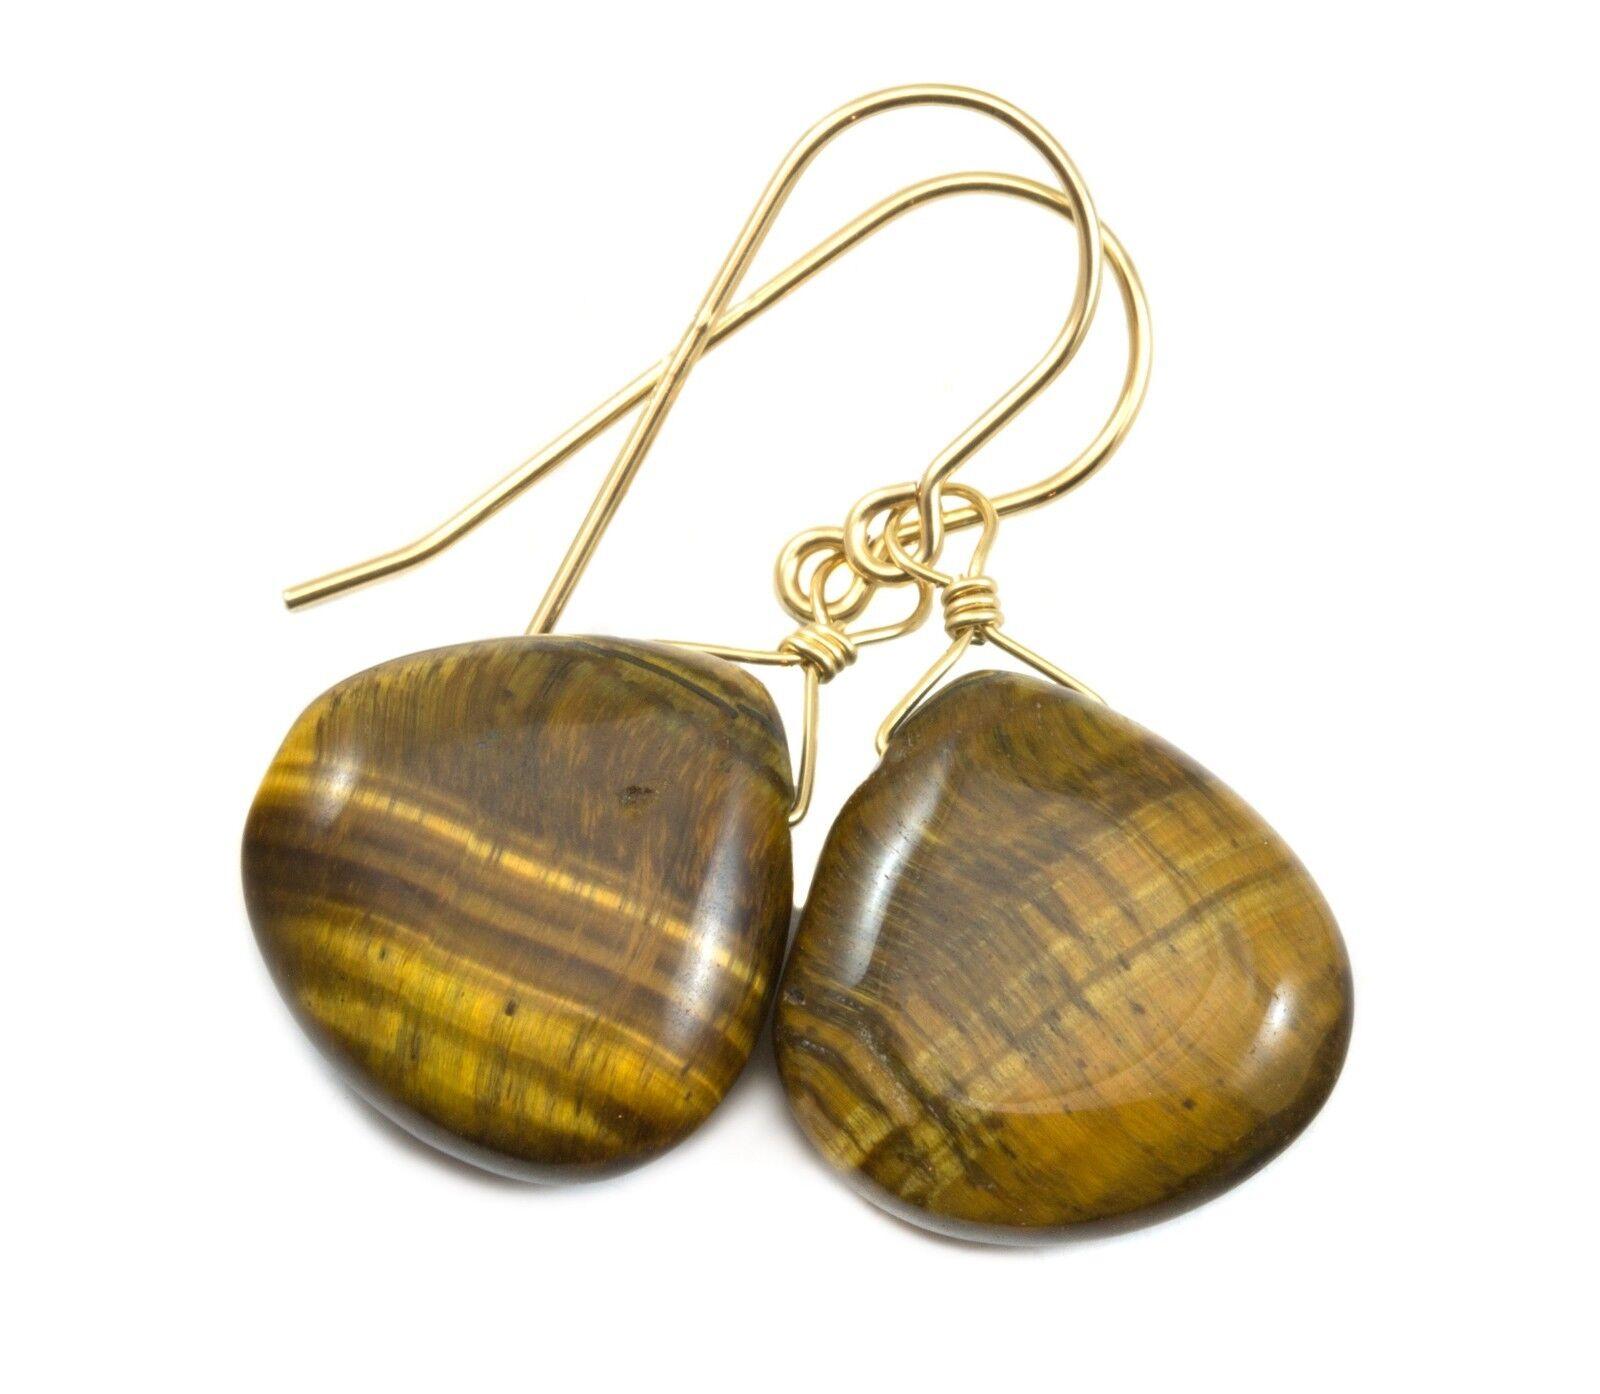 Tiger's Eye Earrings 14k gold Sterling Heart Dangles Drops golden Amber Simple